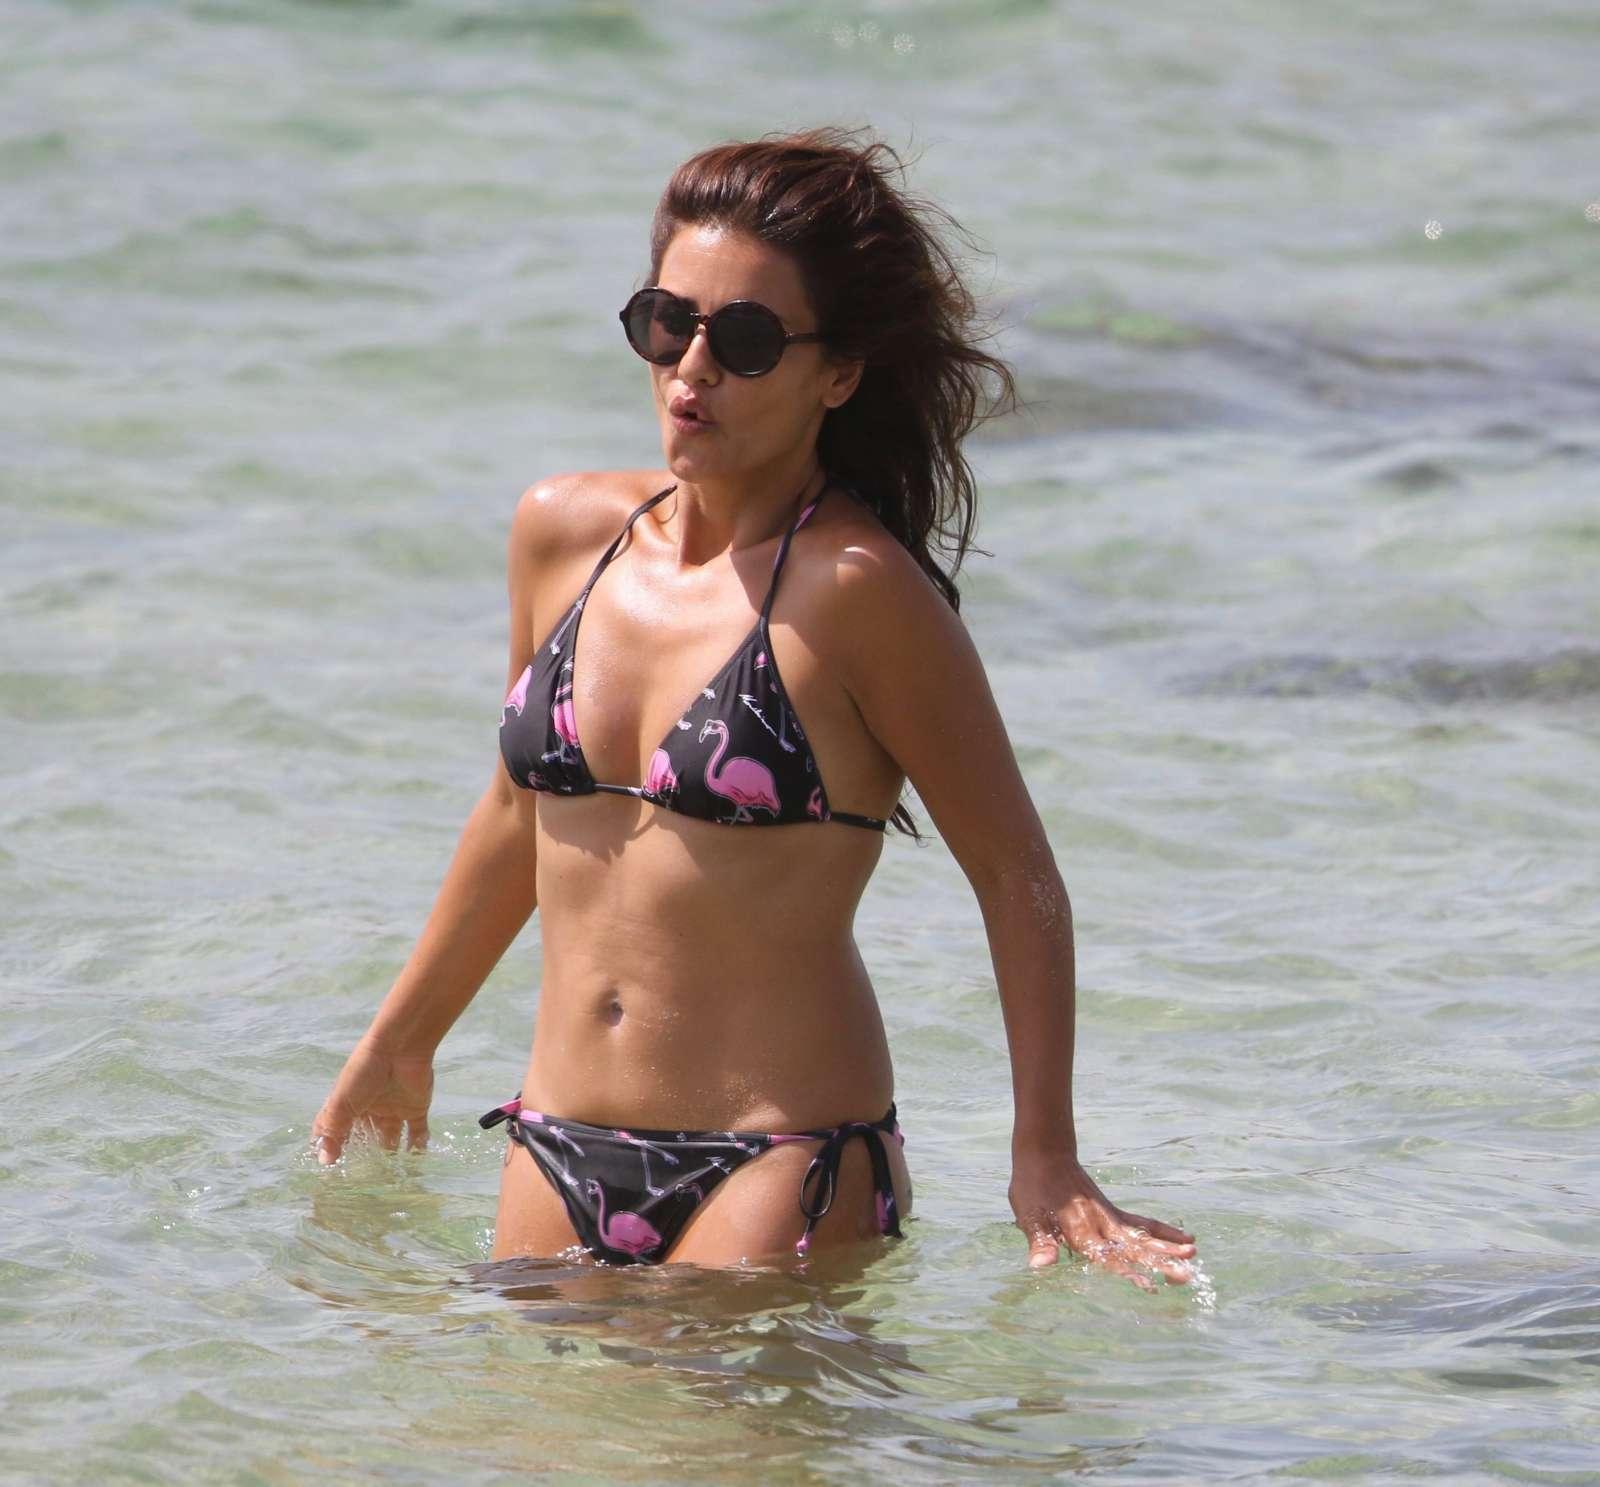 Monica Cruz 2017 : Monica Cruz in Bikini 2017 -42